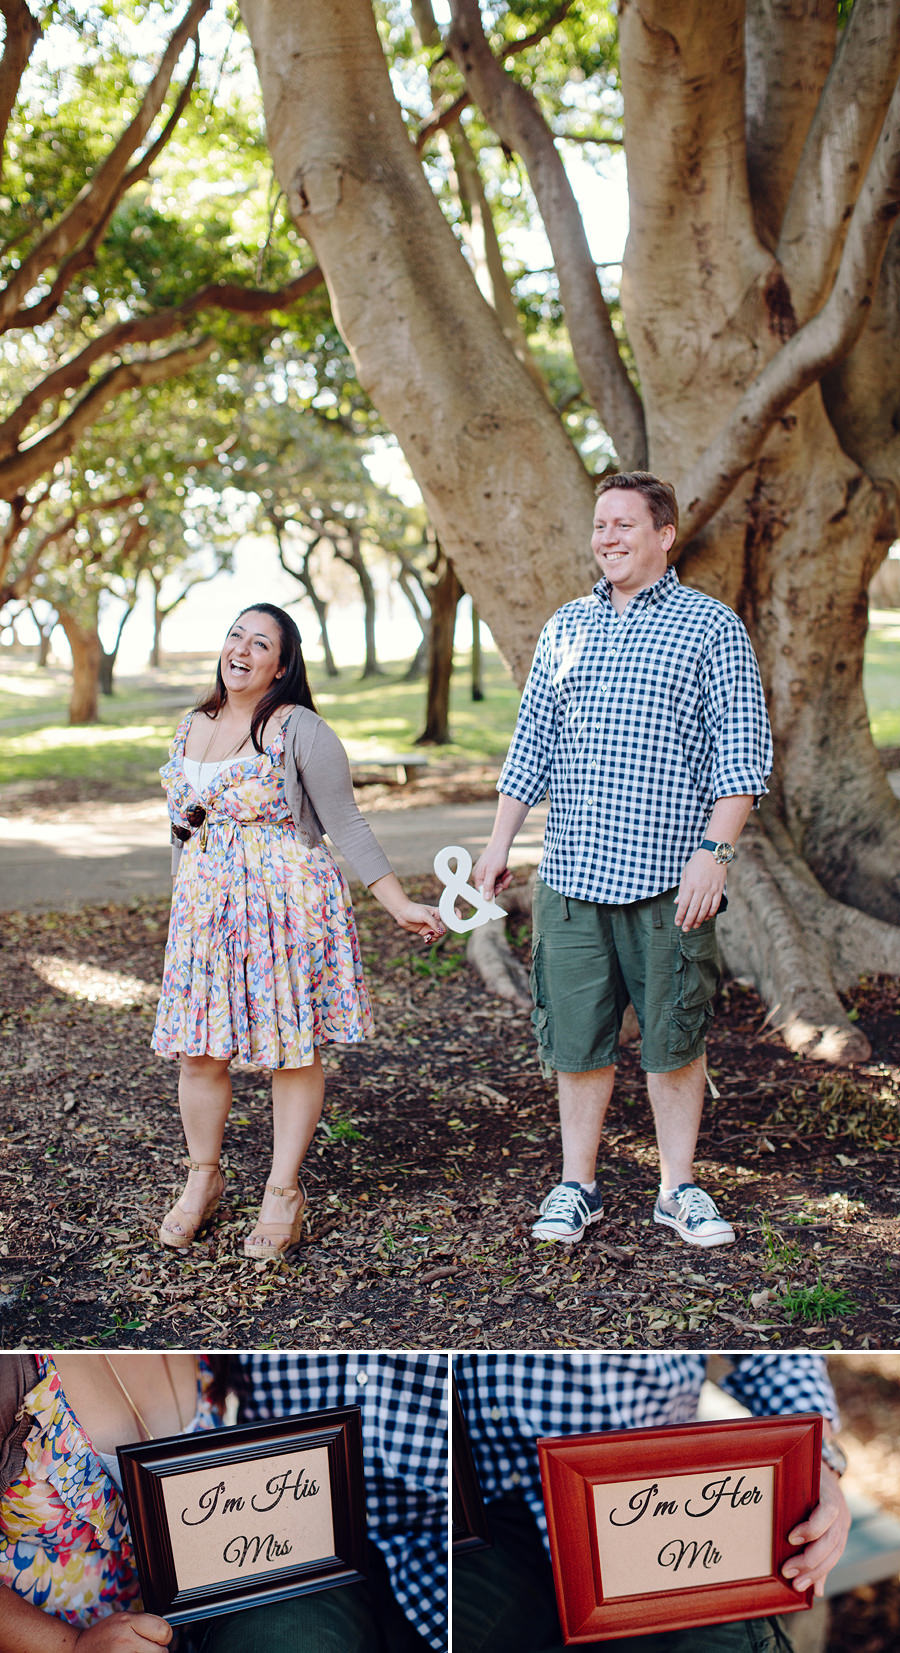 Sydney Engagement Photographers: Vaucluse engagement session